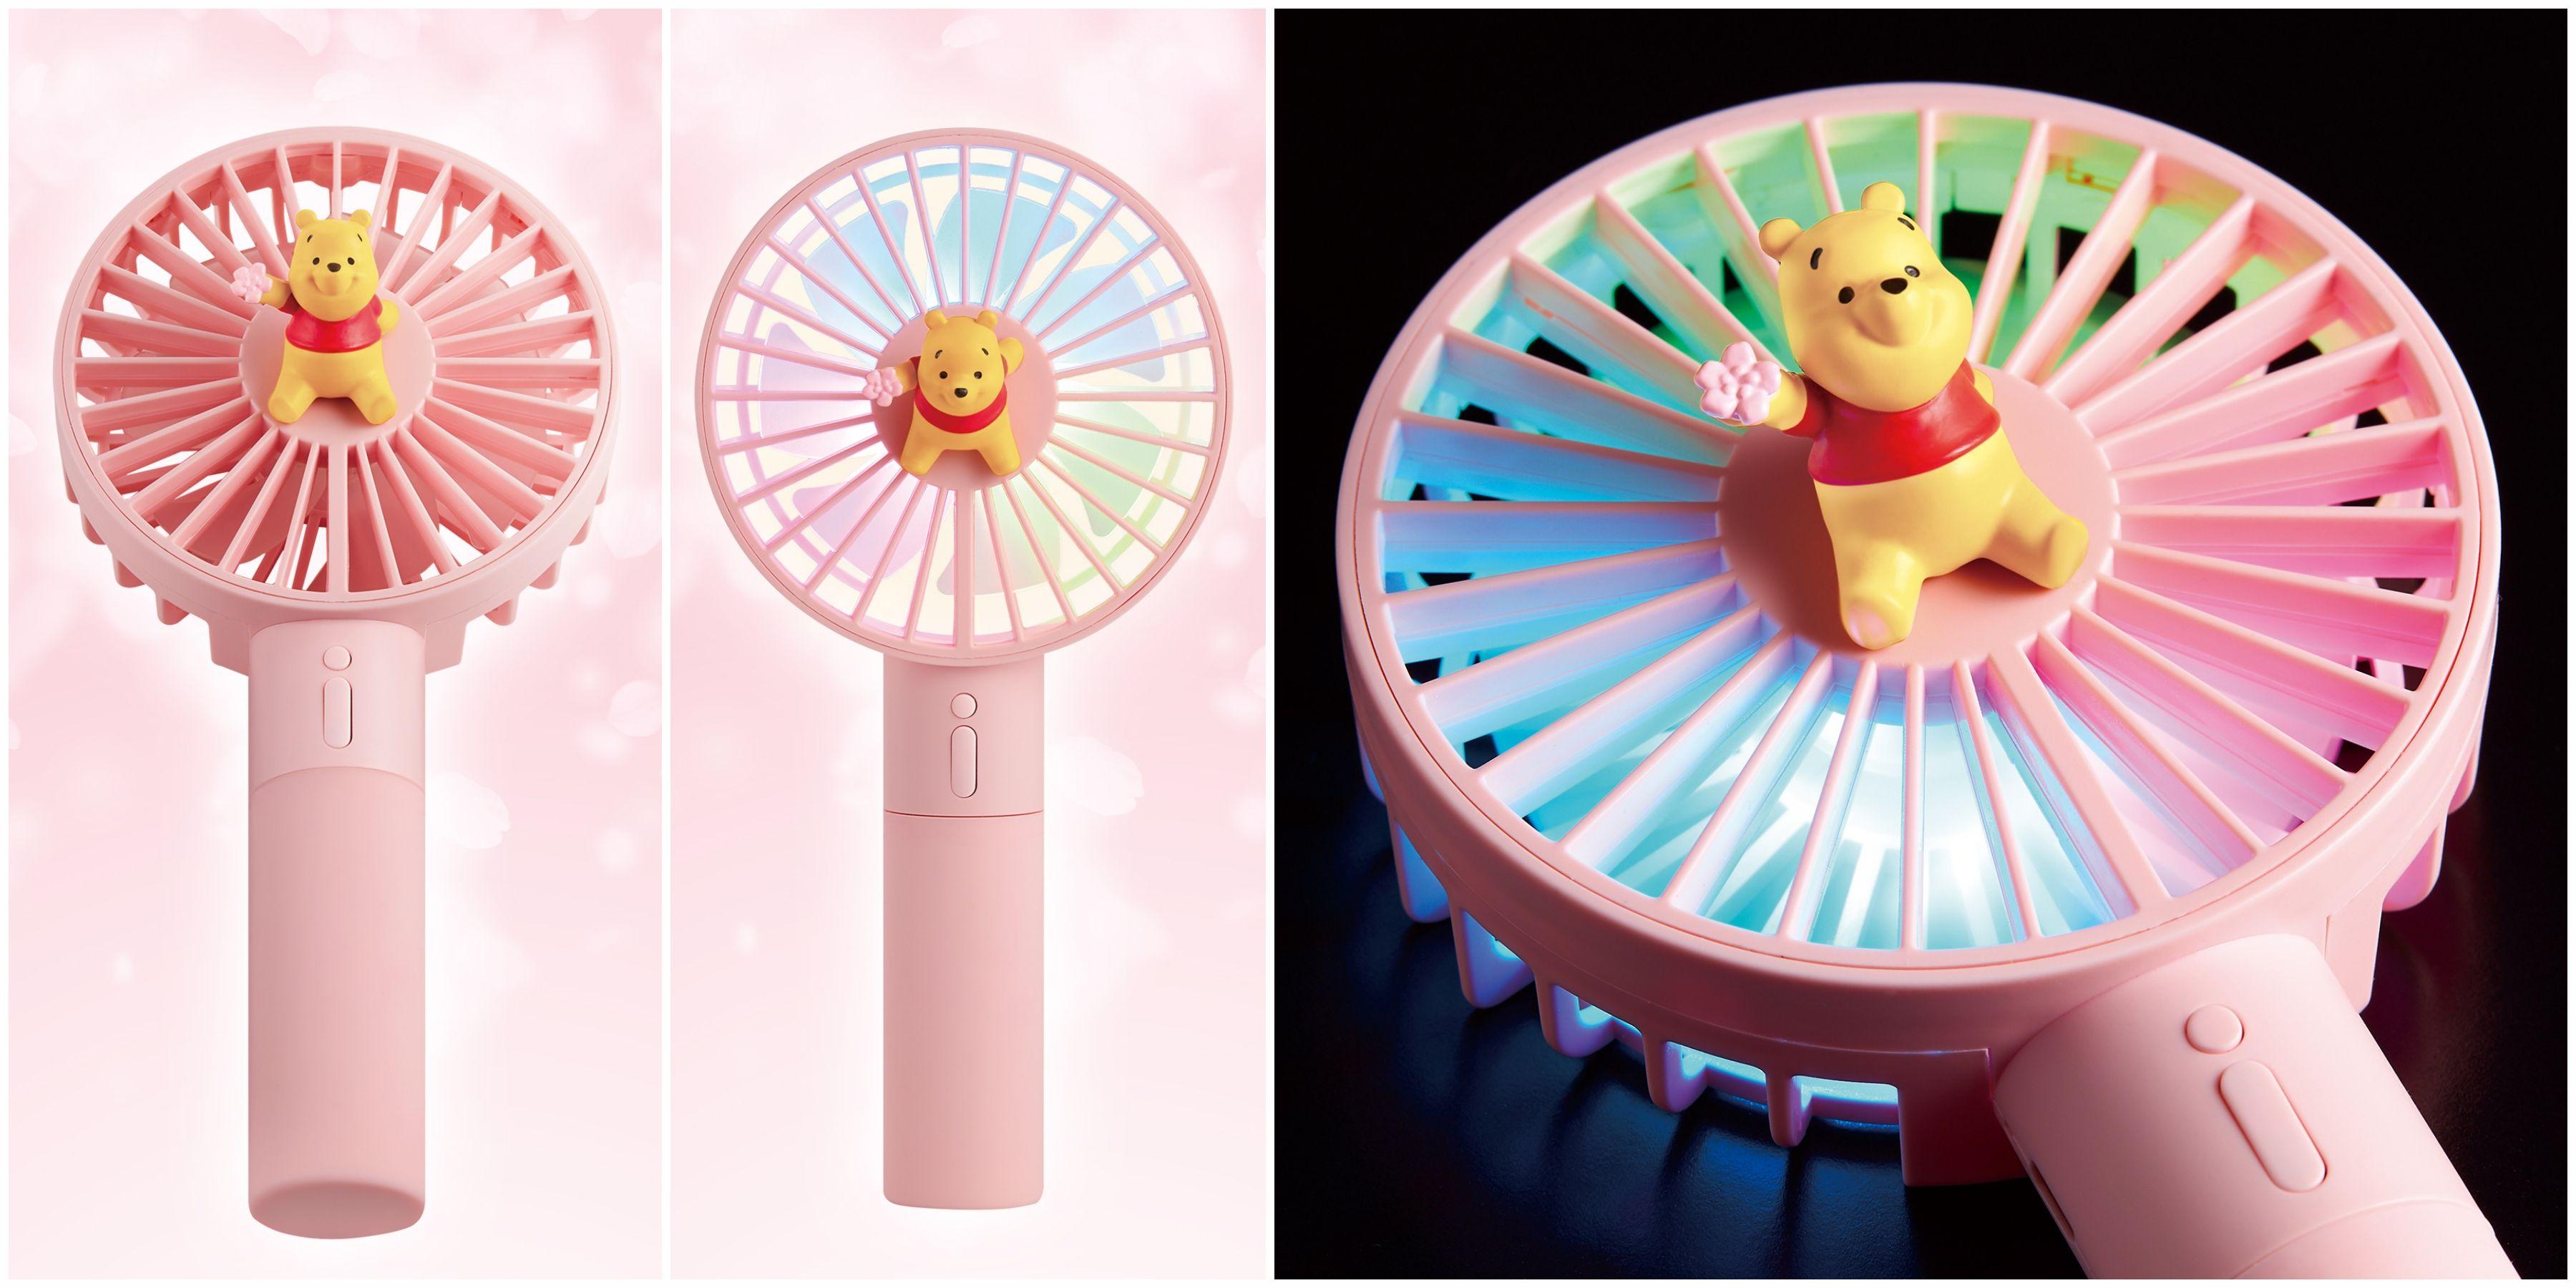 7-ELEVEN,米奇90週年,米奇3c,櫻花季,小熊維尼,隨身風扇,水氧機,藍芽喇叭,粉紅